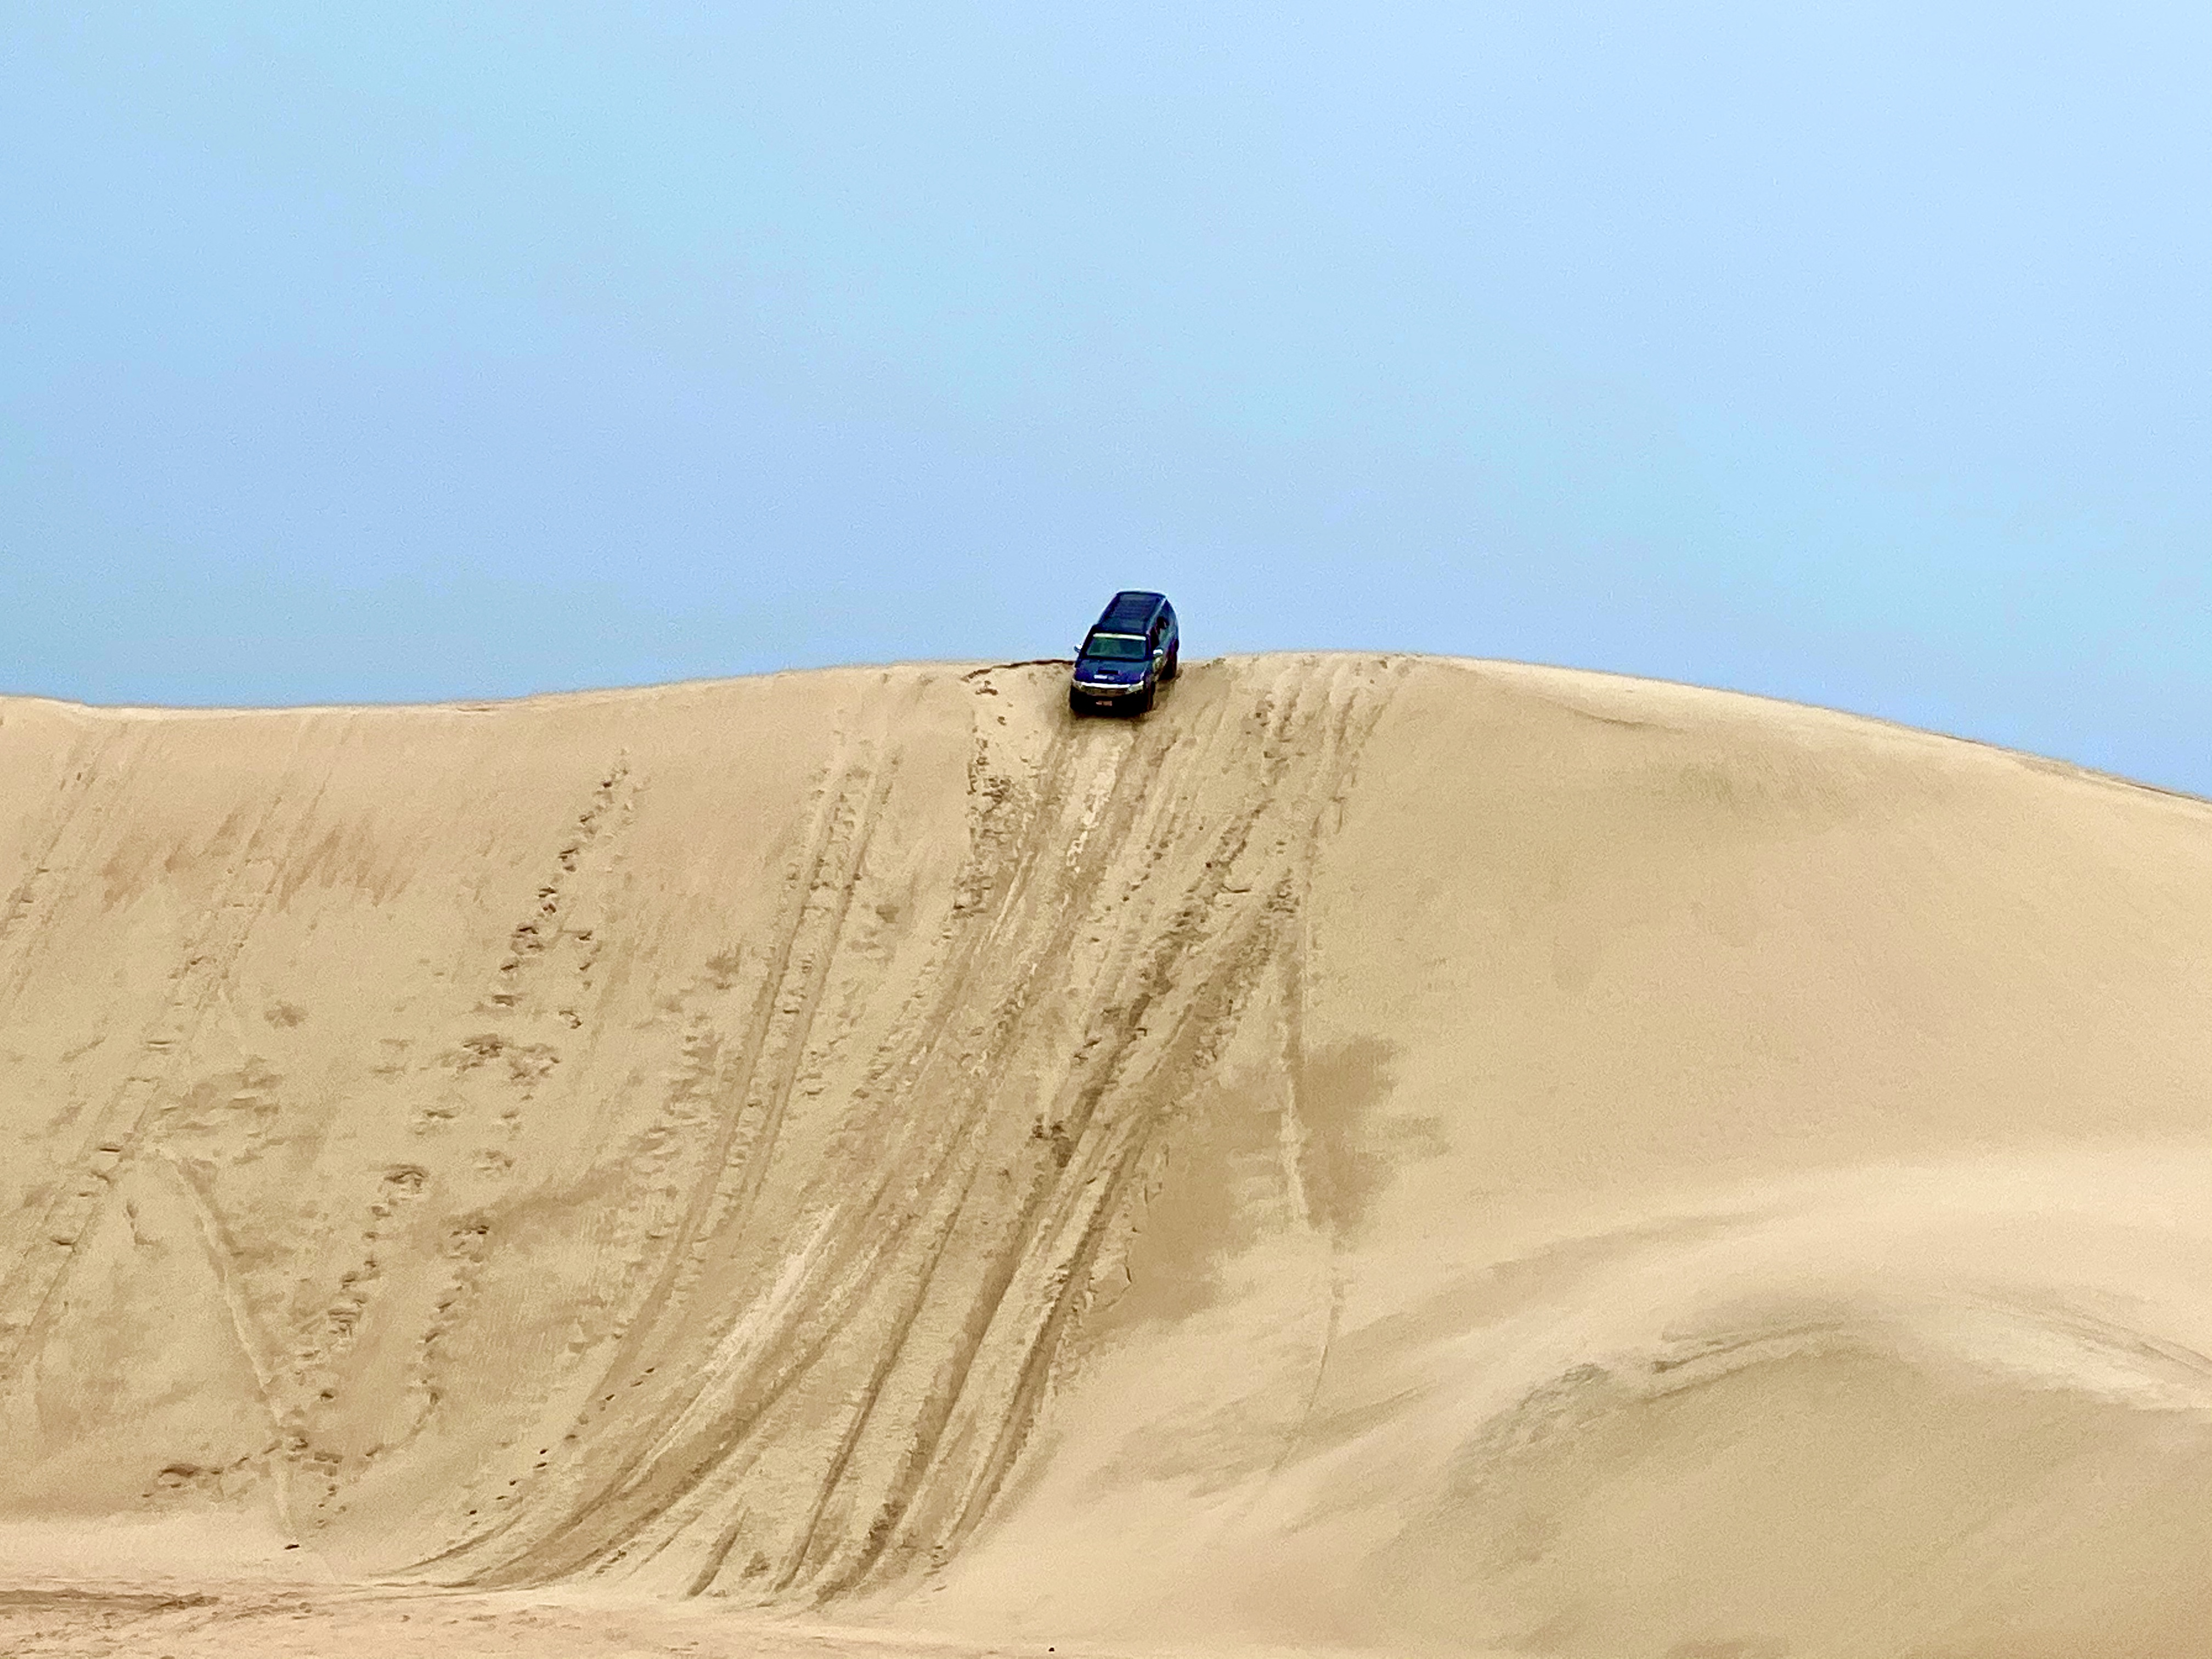 Toyota forte areia dunas jericoacoara